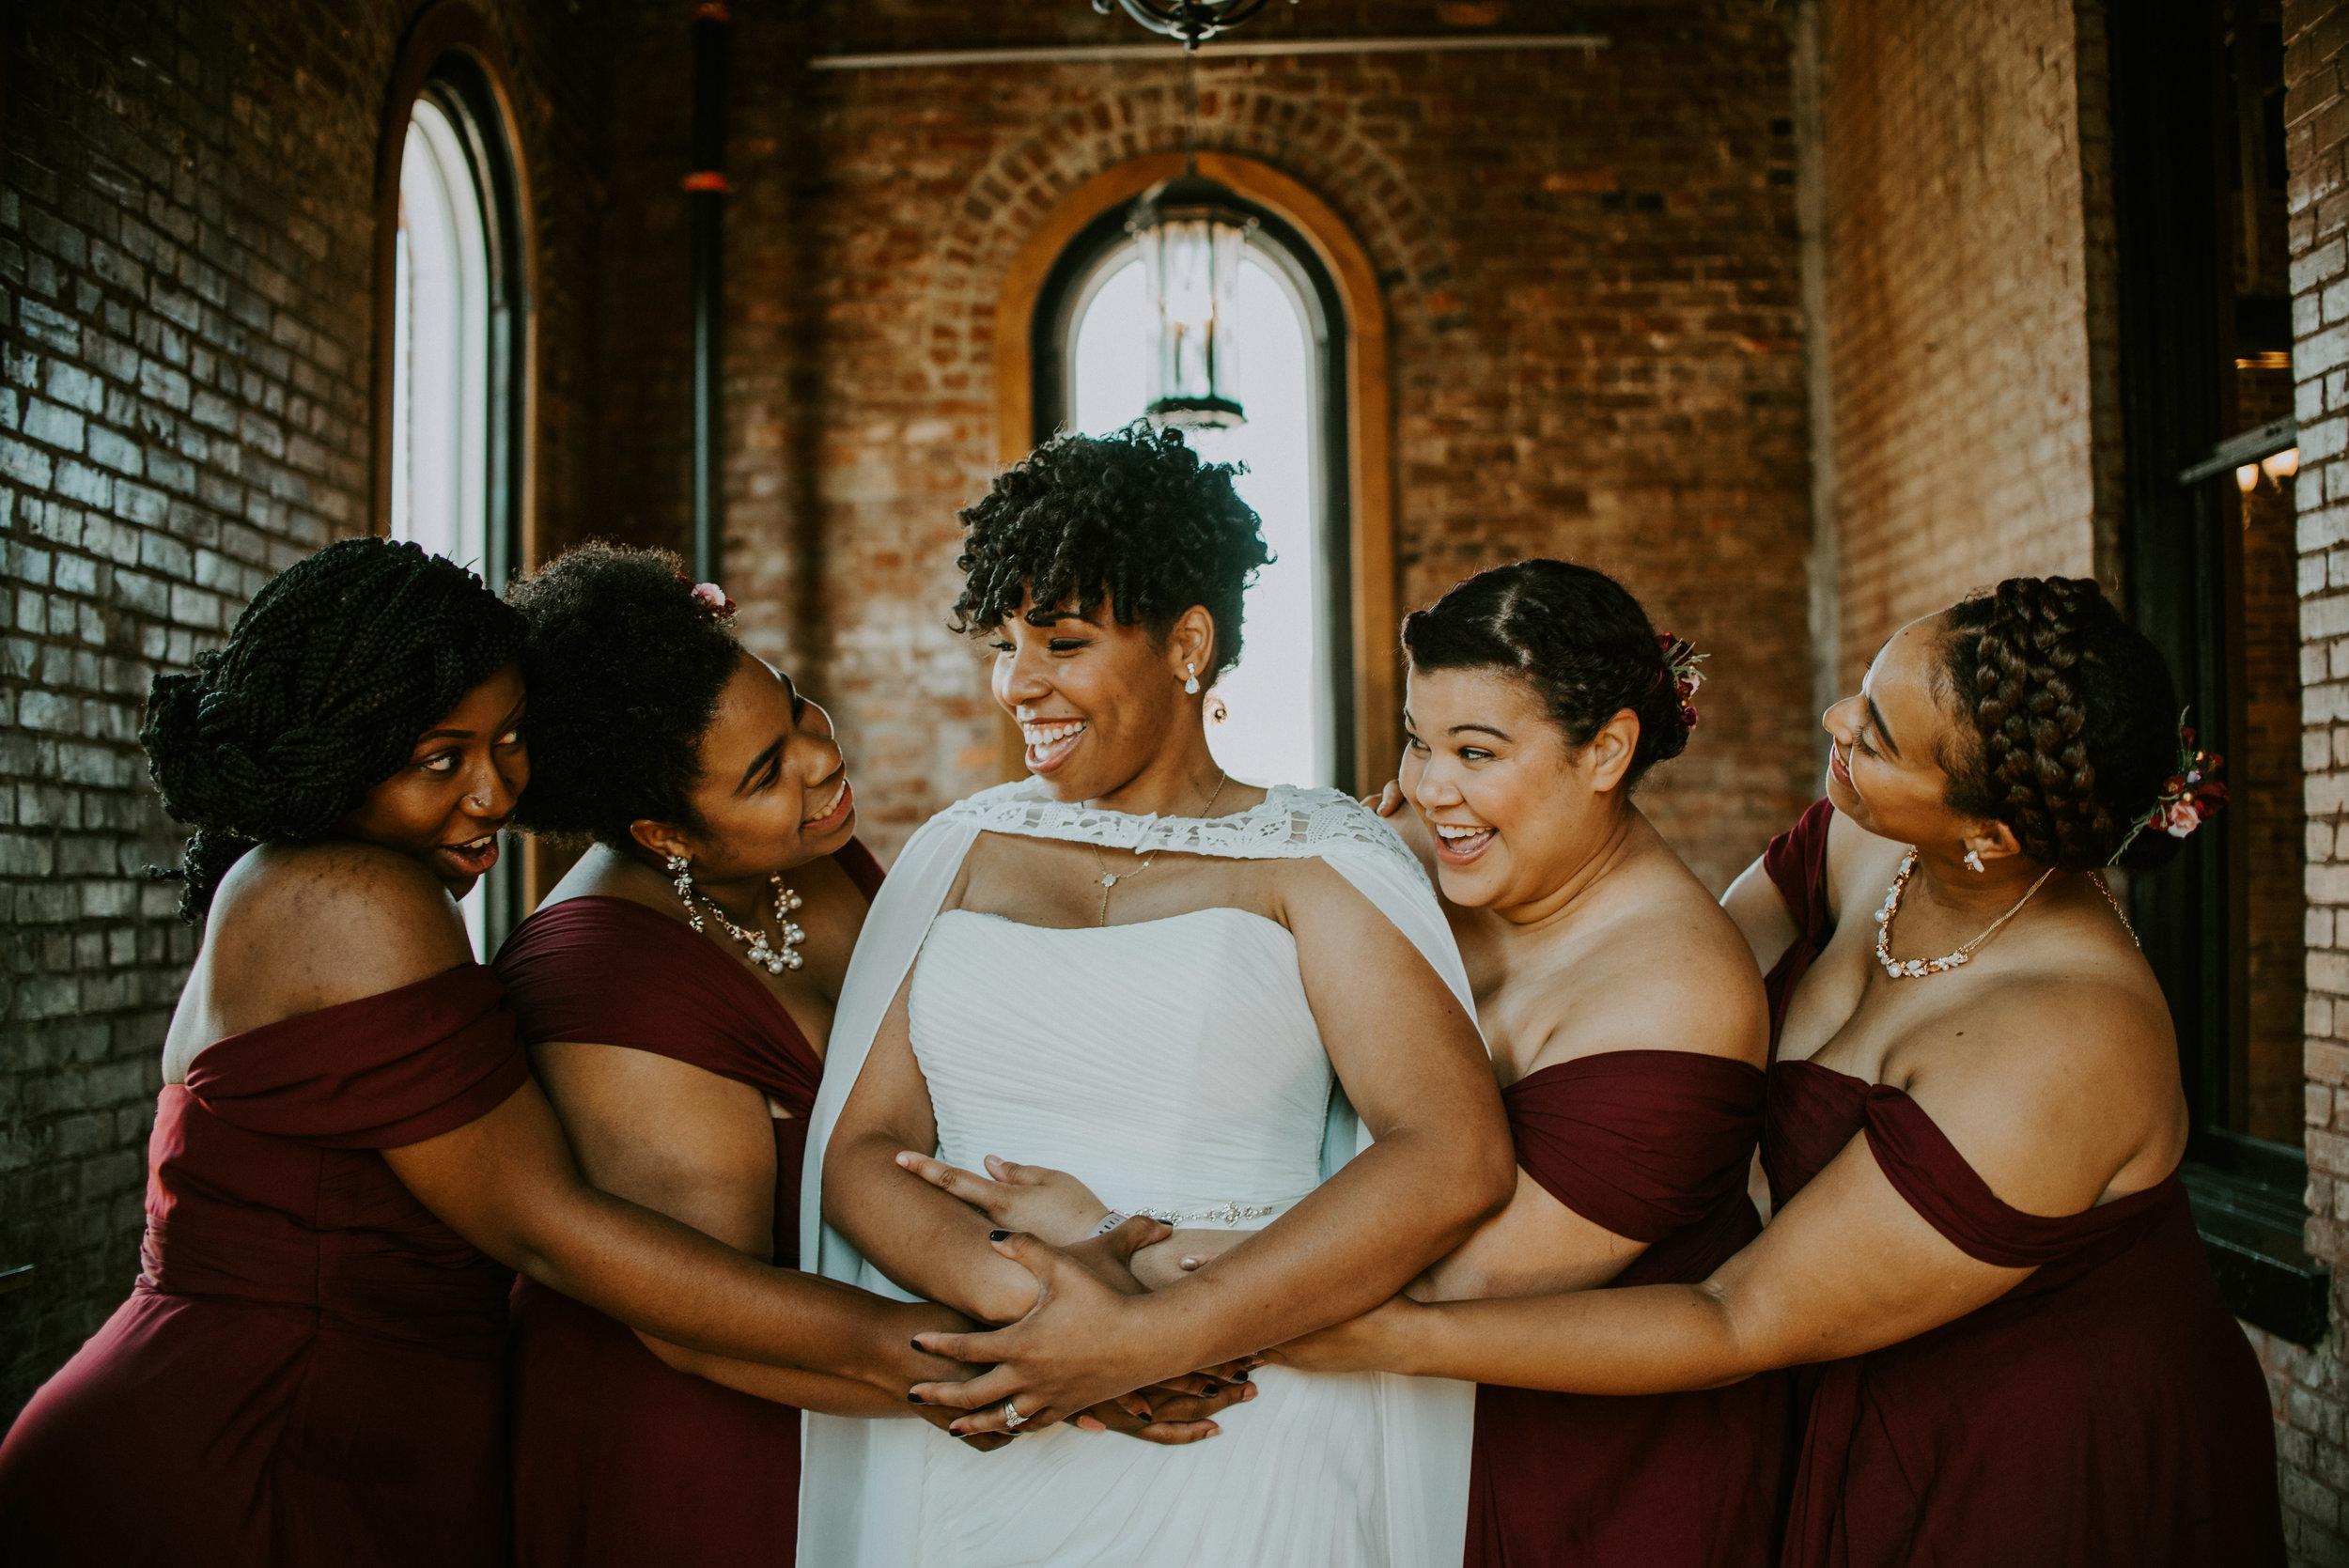 WonderlyCreative_Wedding_6.7.18_Khara&Dwayne_-365.jpg